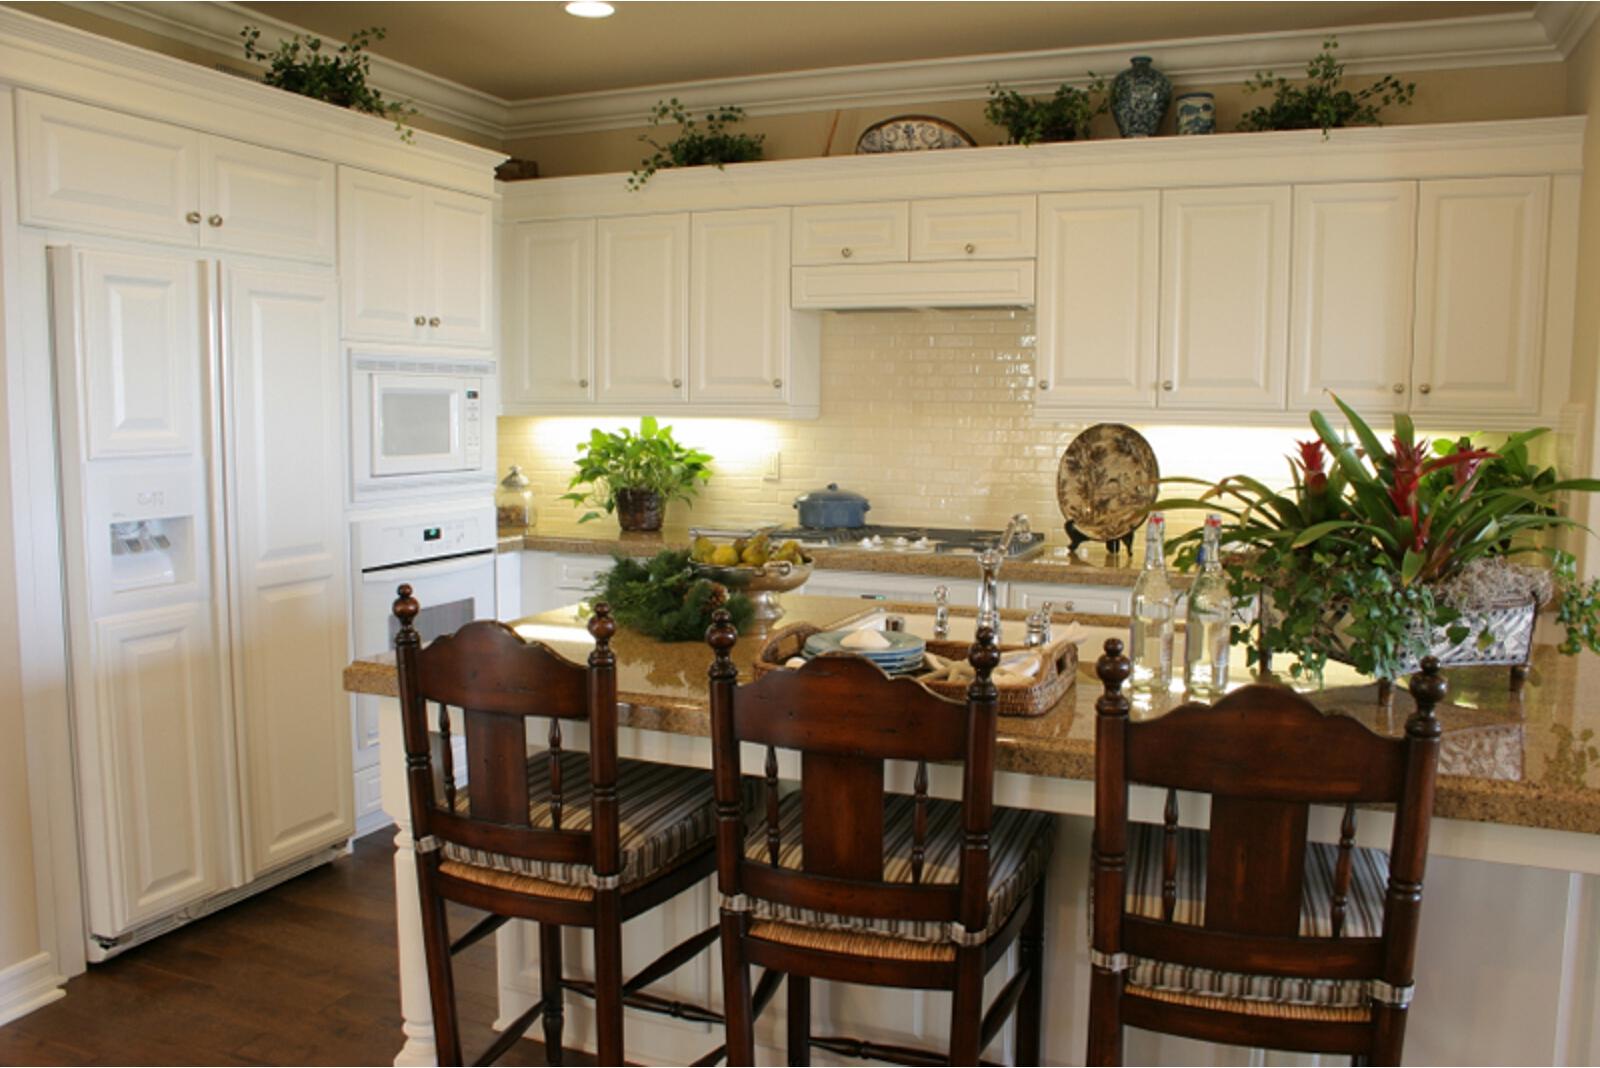 rnovation de cuisine guide de rnovation de cuisine with rnovation de cuisine great projet de. Black Bedroom Furniture Sets. Home Design Ideas